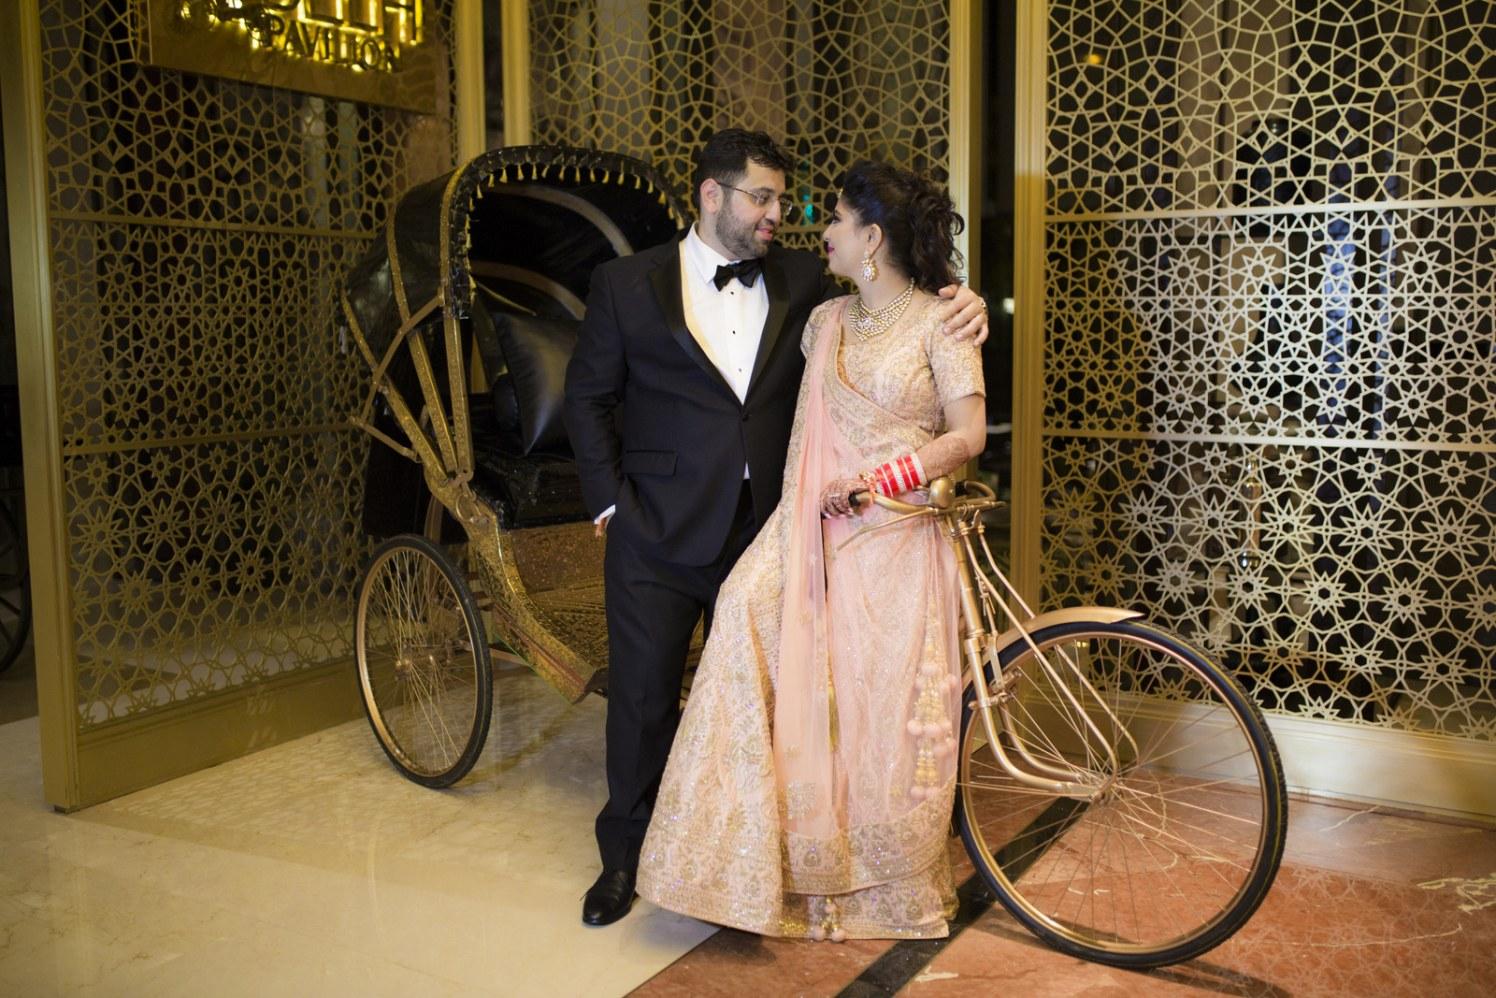 Enduring Captivating Moments by Arpit Gulati Wedding-photography | Weddings Photos & Ideas